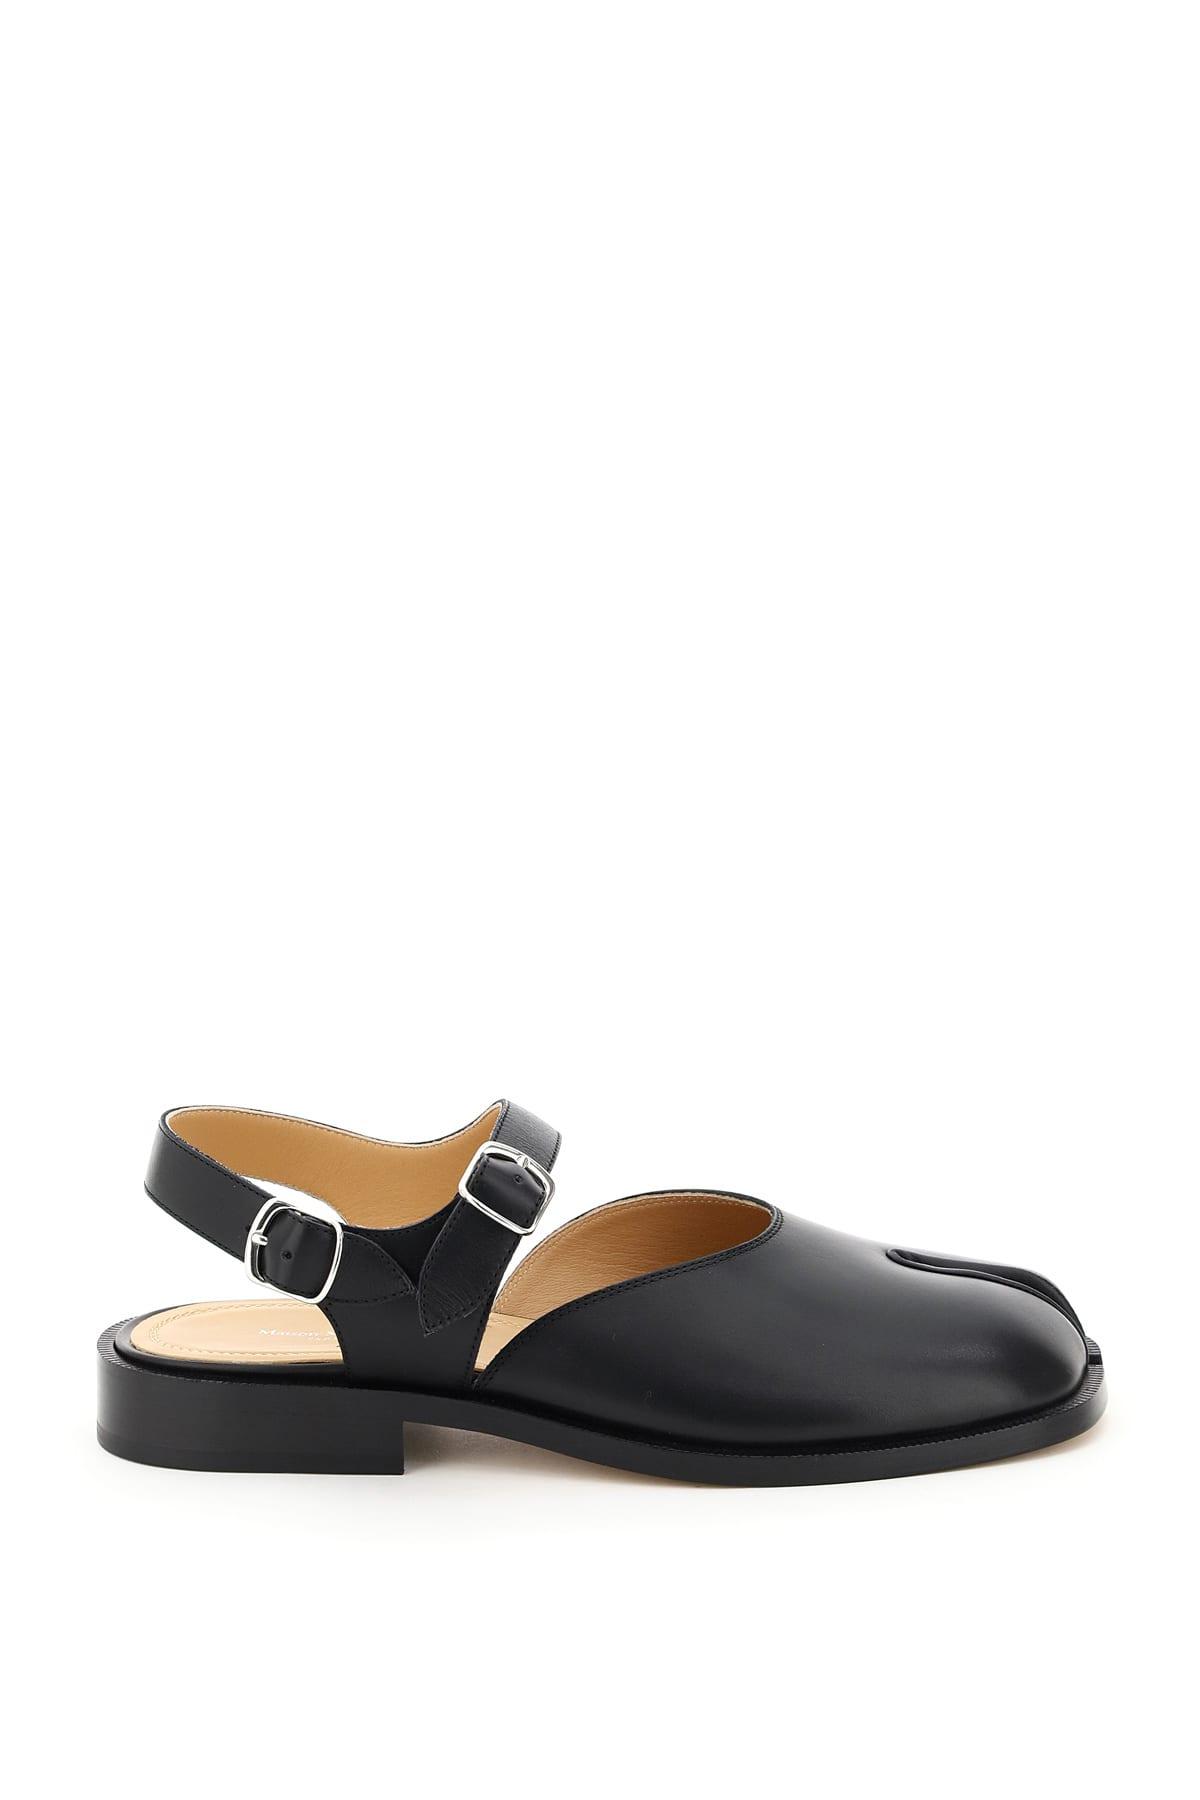 Maison Margiela Sandals TABI LEATHER SANDALS